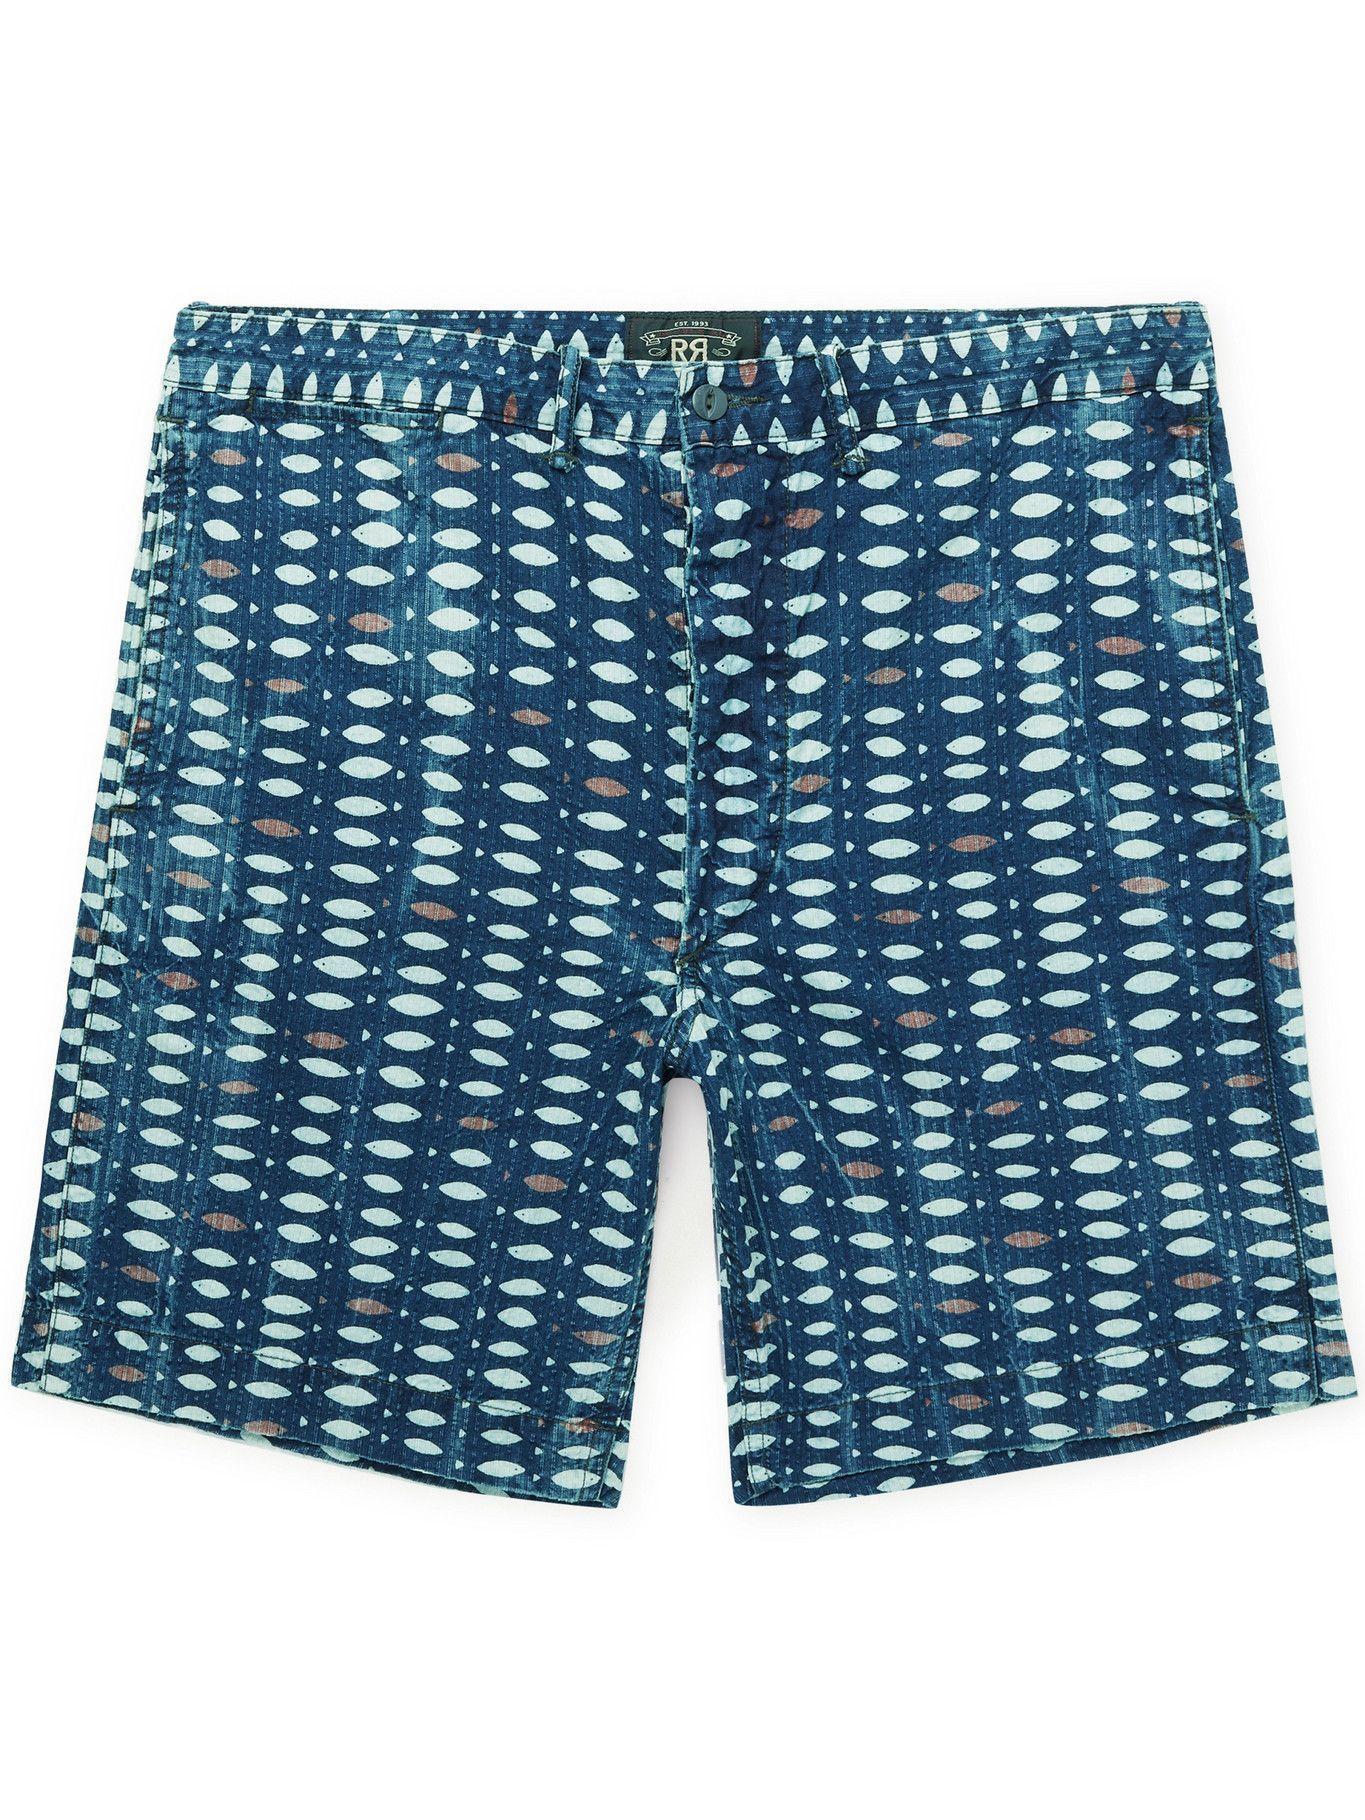 RRL - Sands Printed Cotton-Seersucker Shorts - Blue